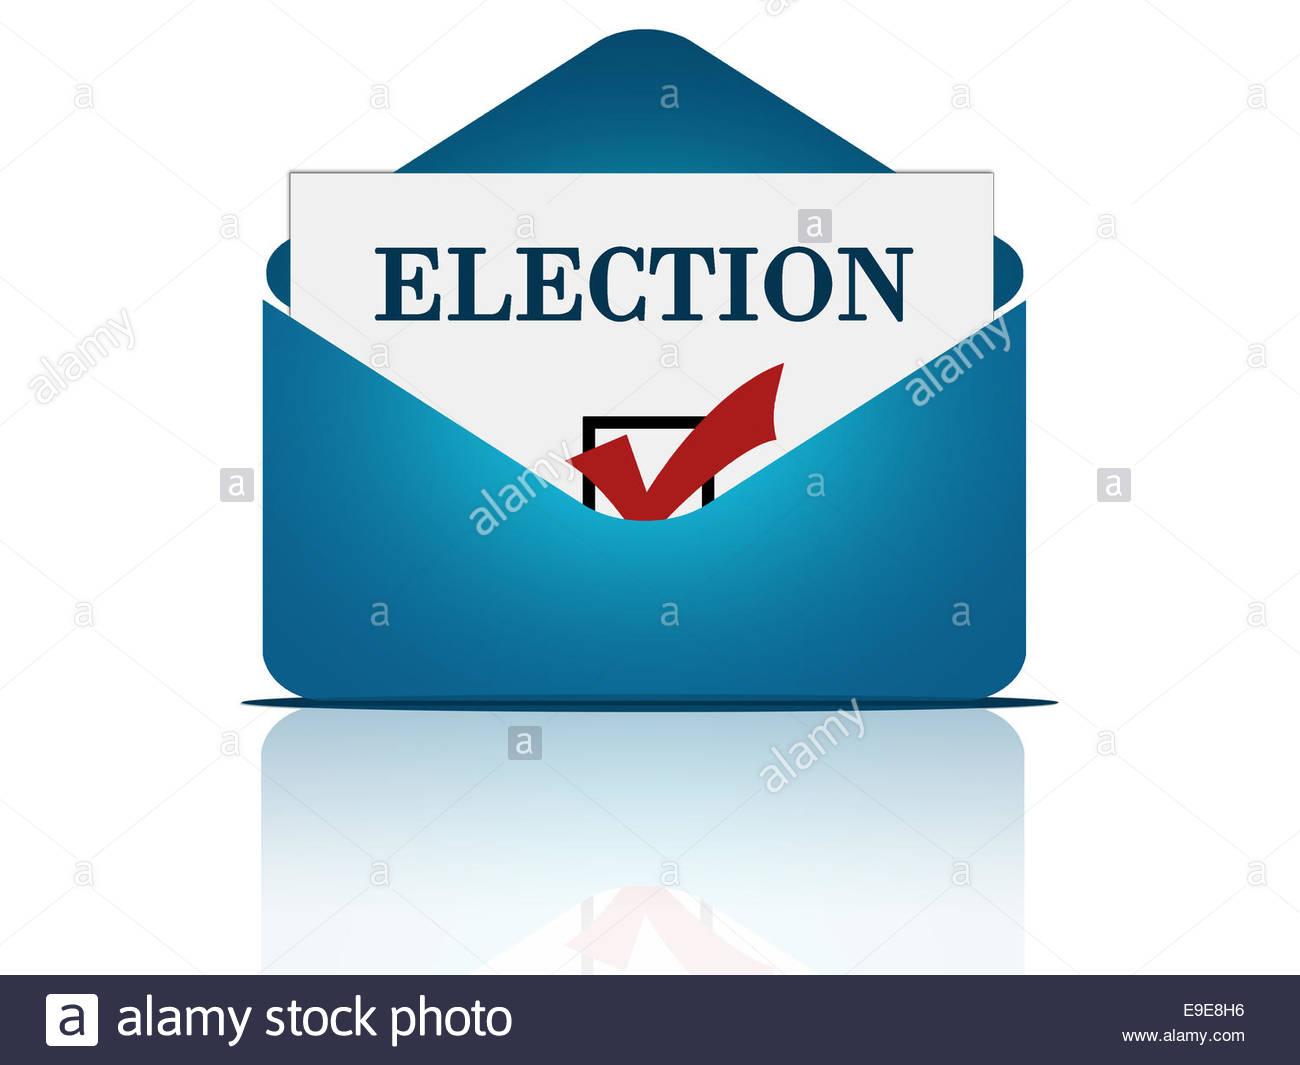 Postal voting concept - Stock Image